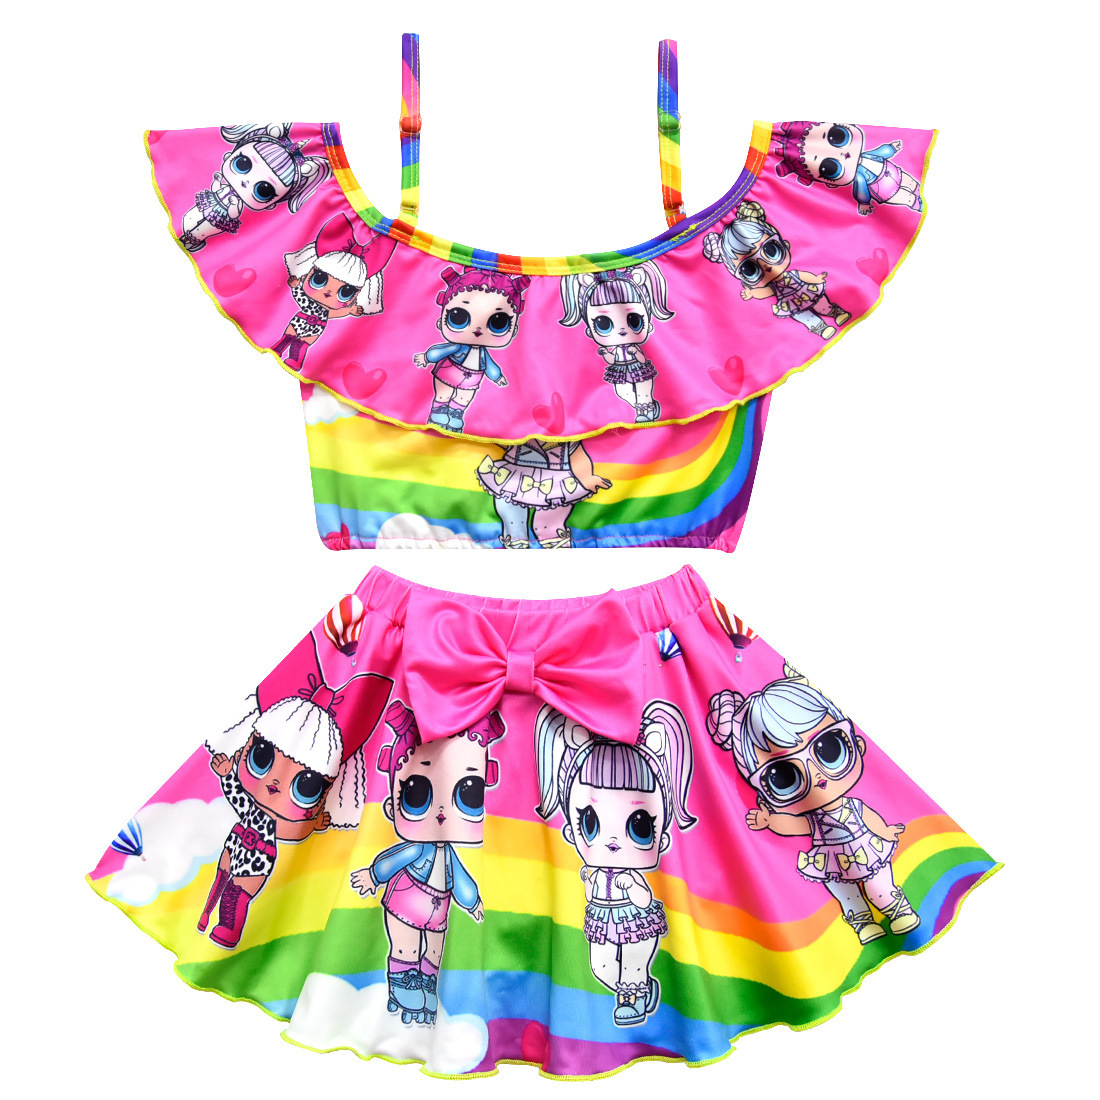 Toddler Girls Swim Wear 2019 Lol Bikini Kids Swimsuit Sling Adjustable Cartoon Print Beach Wear Sling Bathing Suit Set For Girls